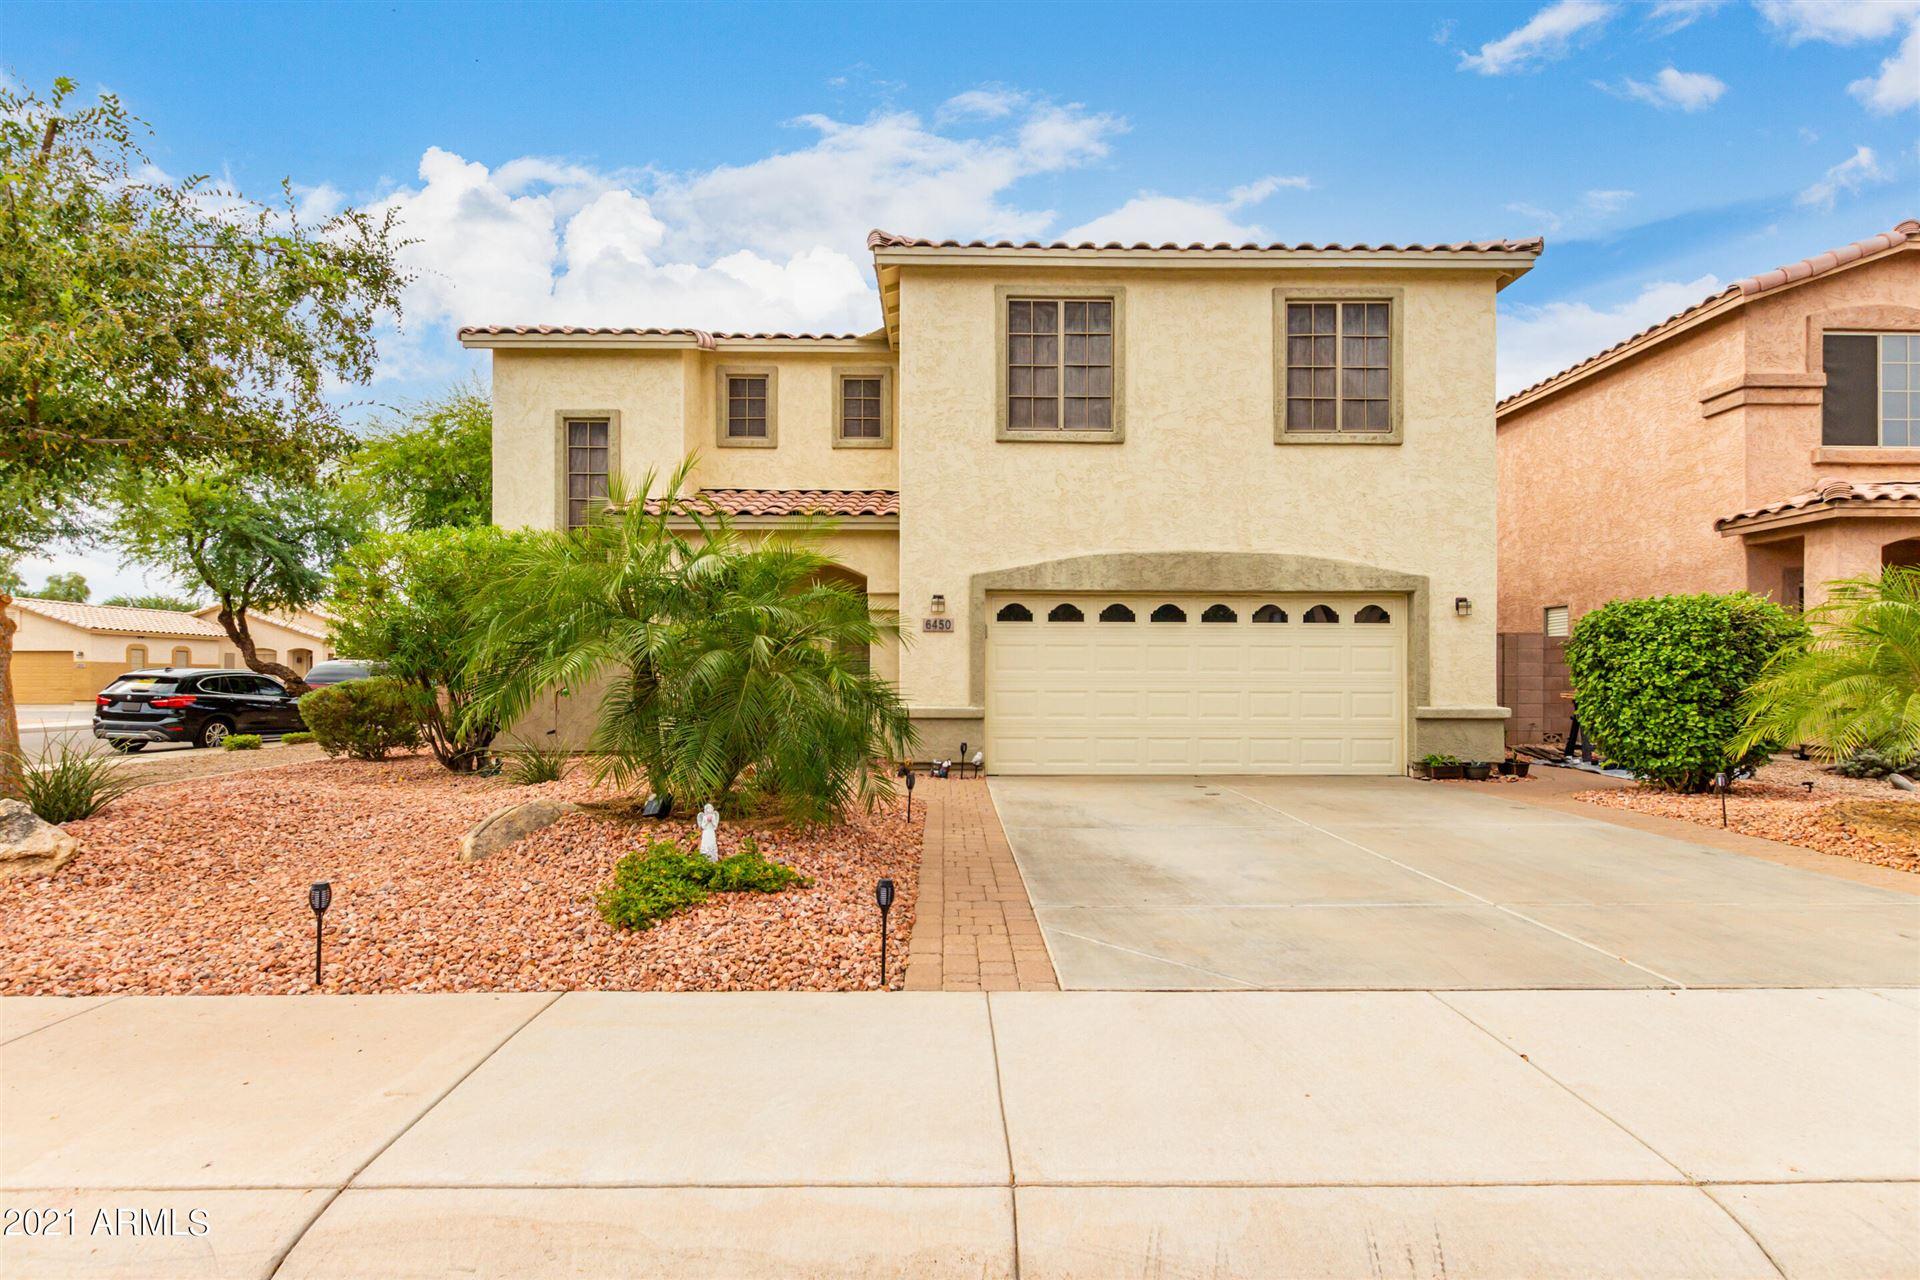 Photo of 6450 S KIMBERLEE Way, Chandler, AZ 85249 (MLS # 6309386)